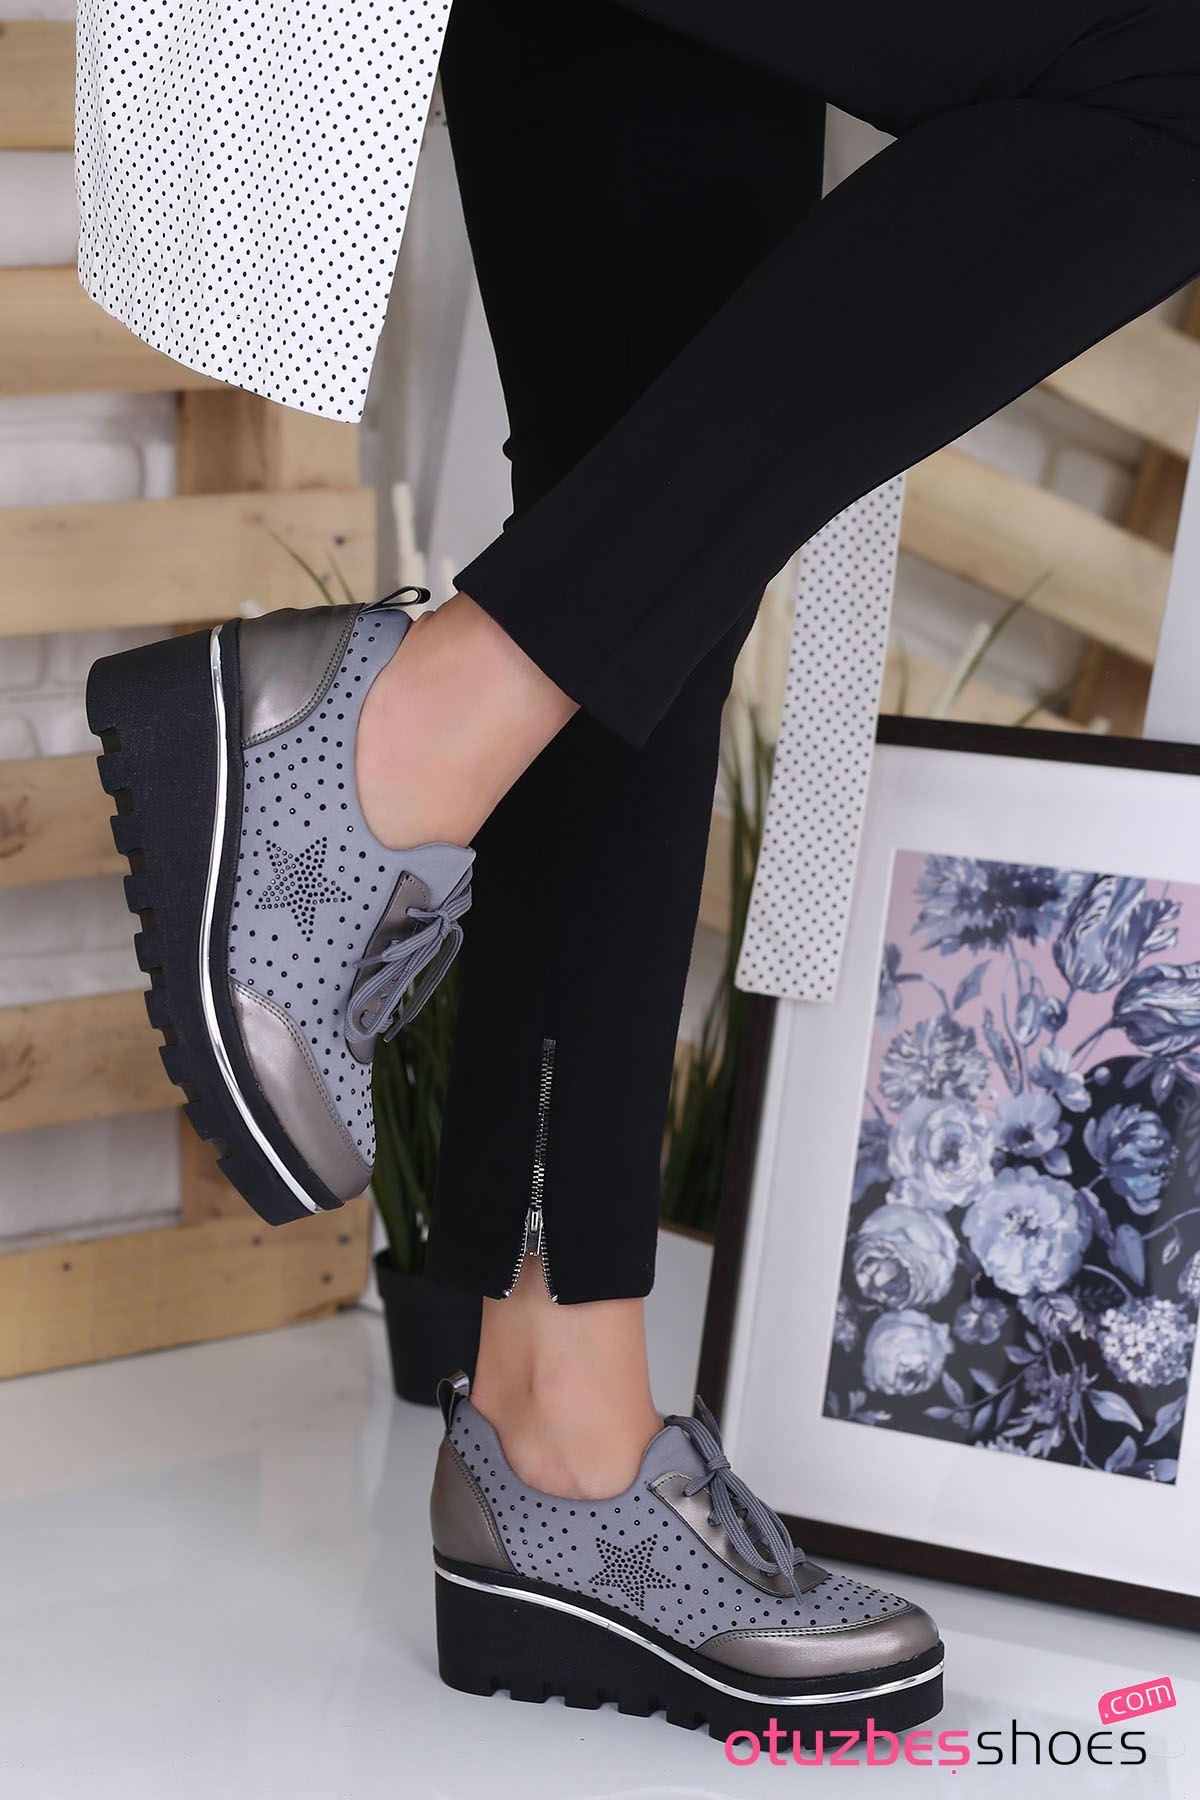 Wassa Dalgıç Kumaş Taş Detay Dolgu Topuk Ayakkabı Gri